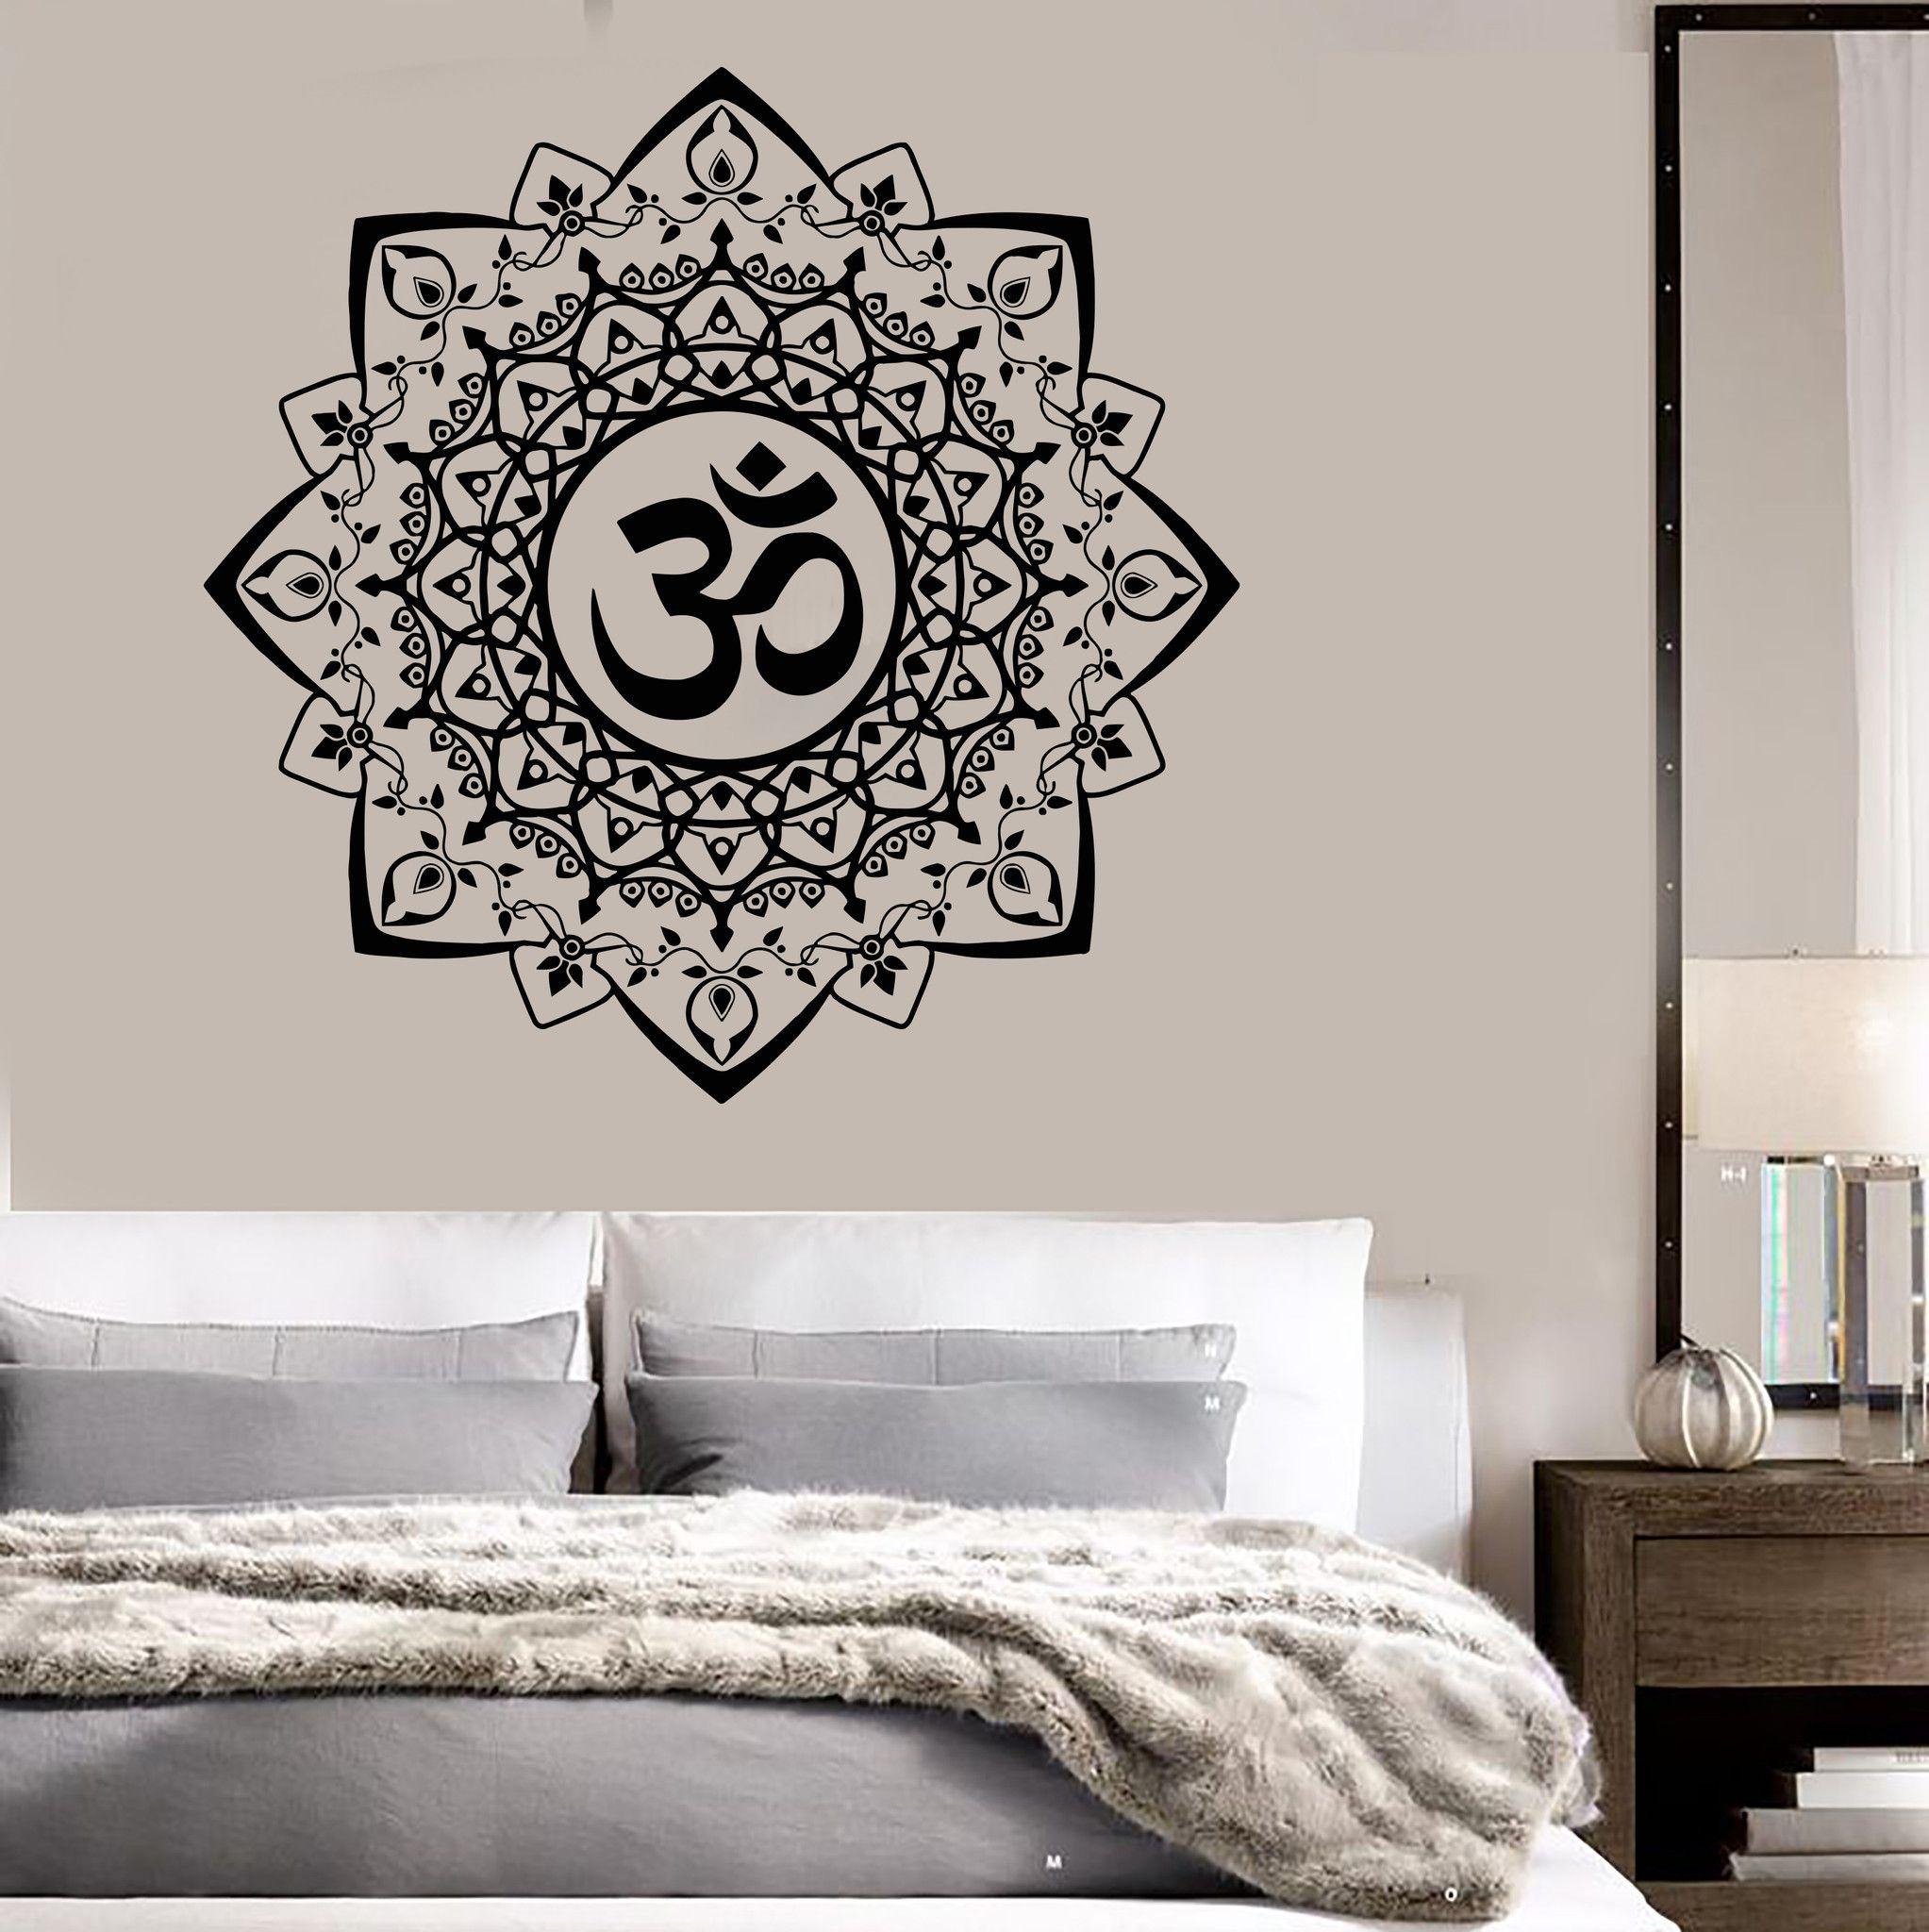 Vinyl Wall Decal Buddhism Mandala Ornament Om Bedroom Stickers - Zen wall decalsvinyl wall decal yin yang yoga zen meditation bedroom decor